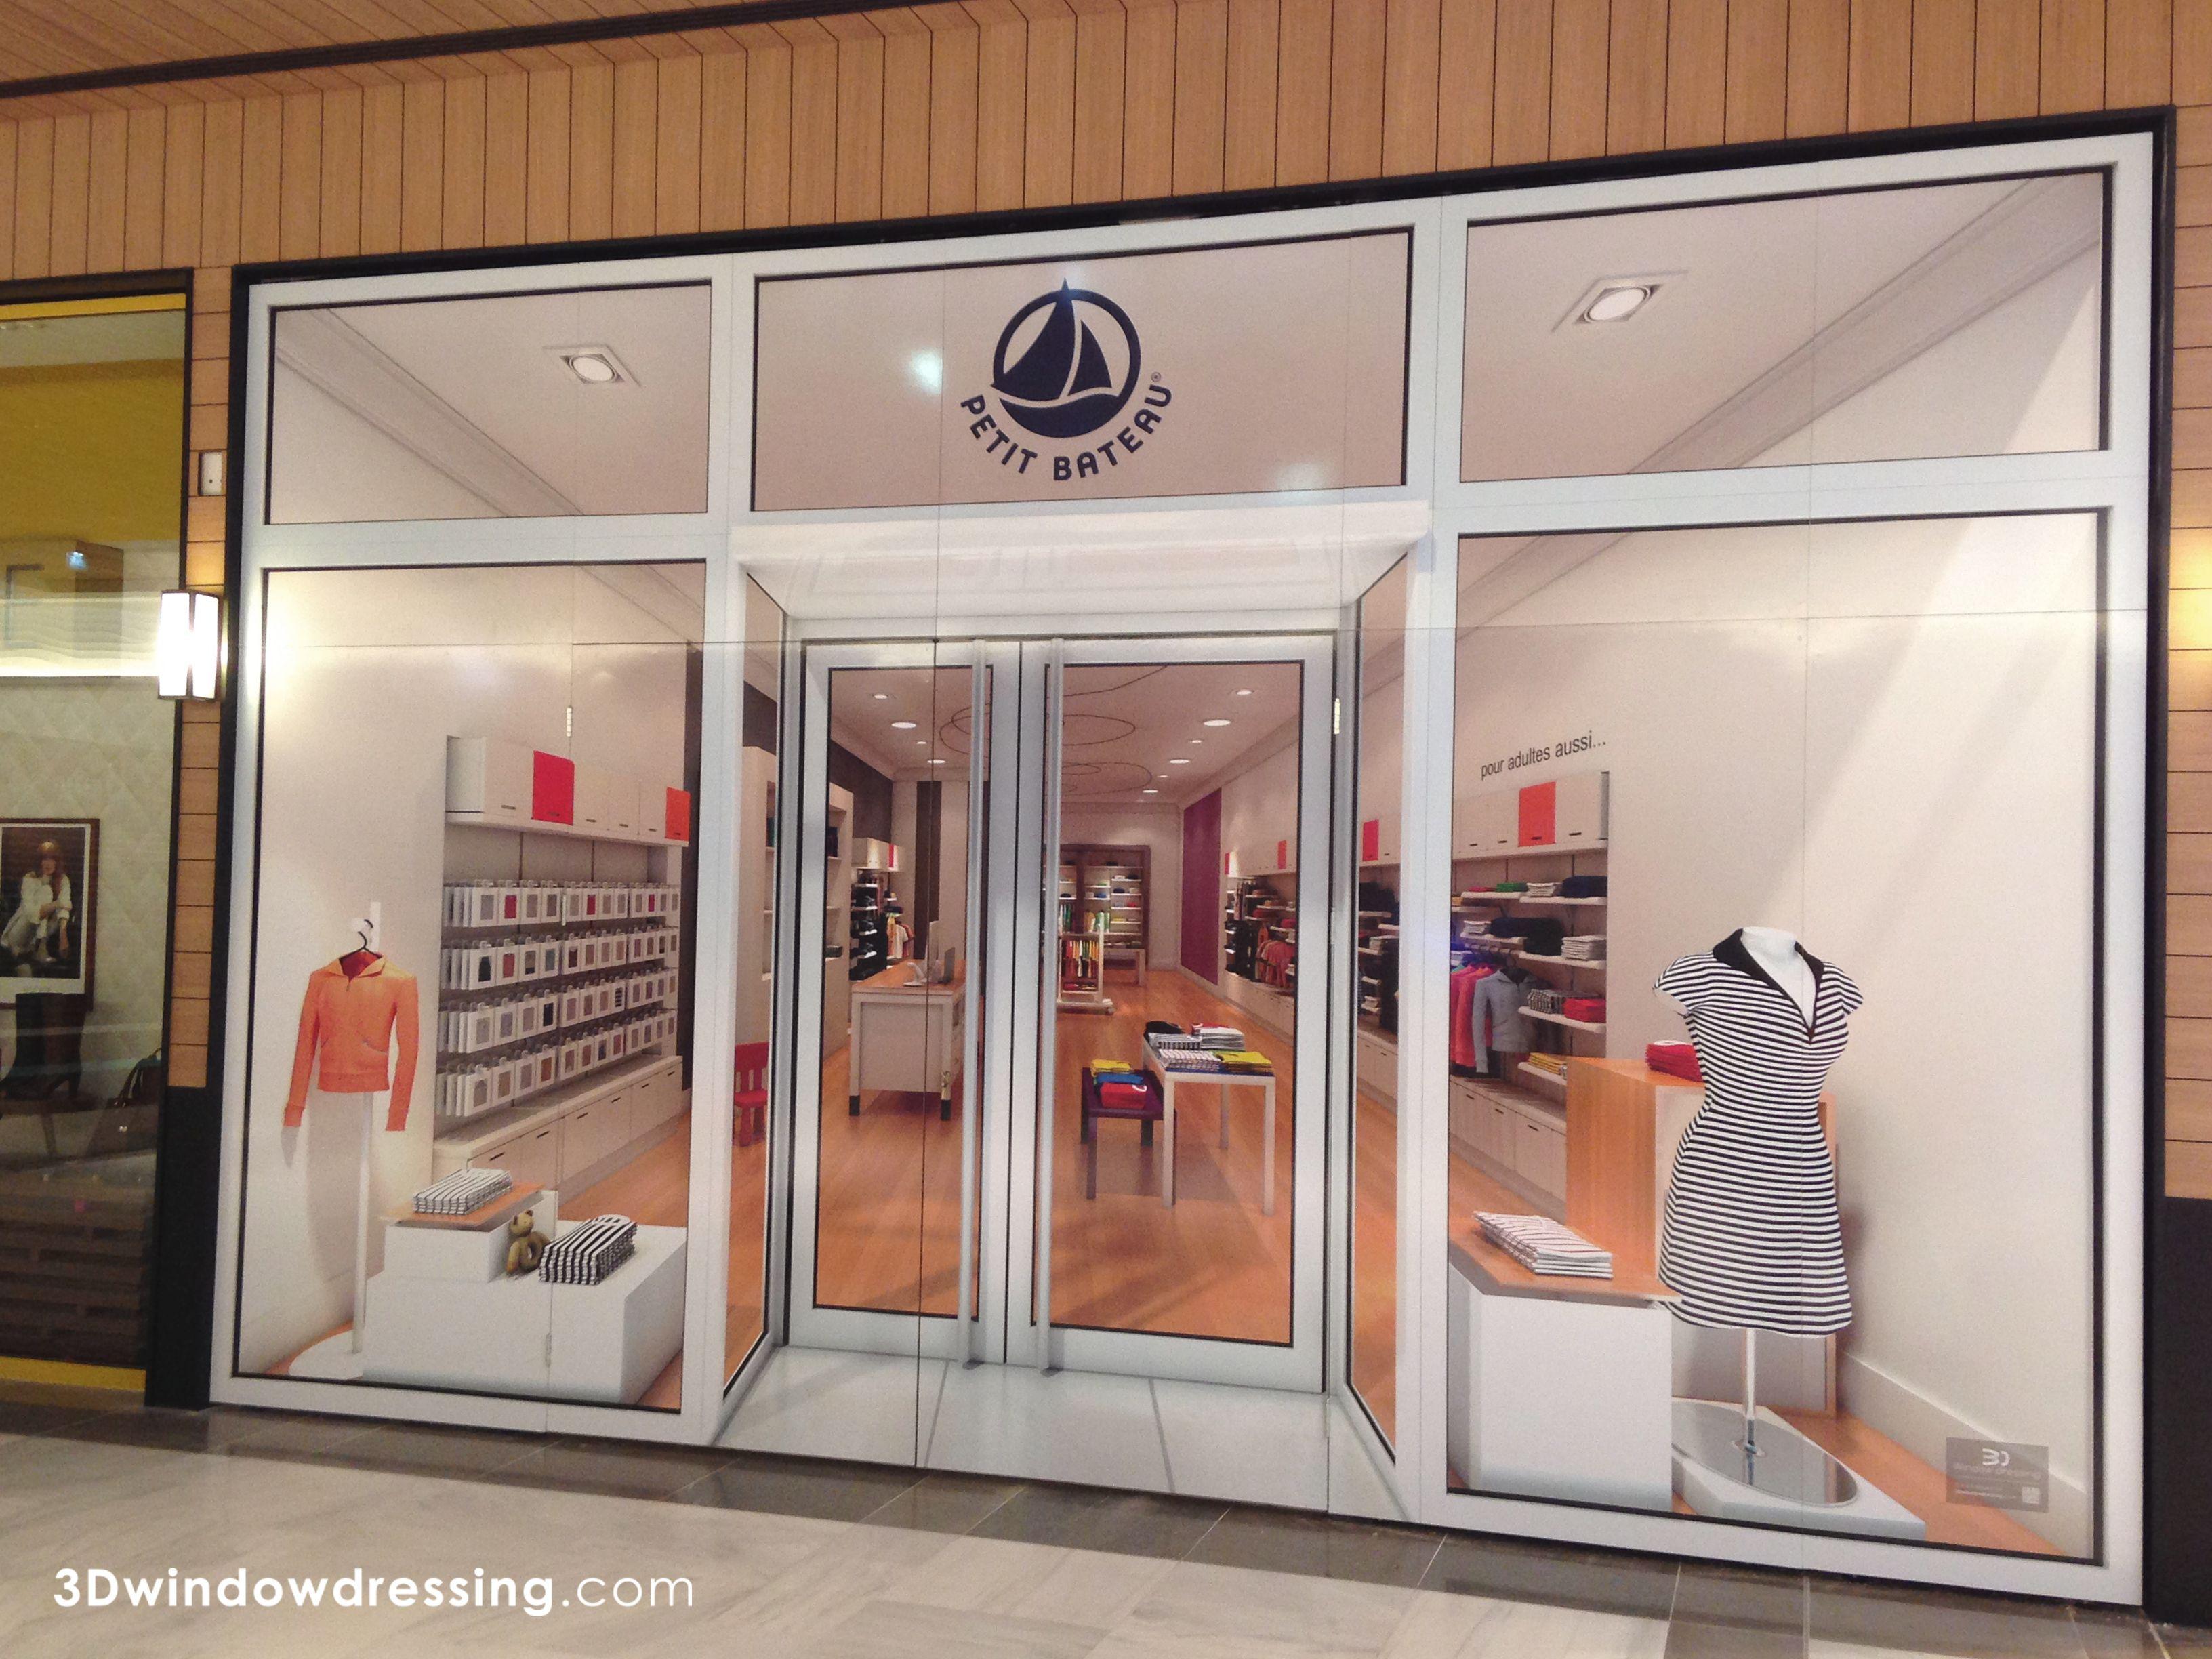 3d window dressing petit bateau was installed in. Black Bedroom Furniture Sets. Home Design Ideas